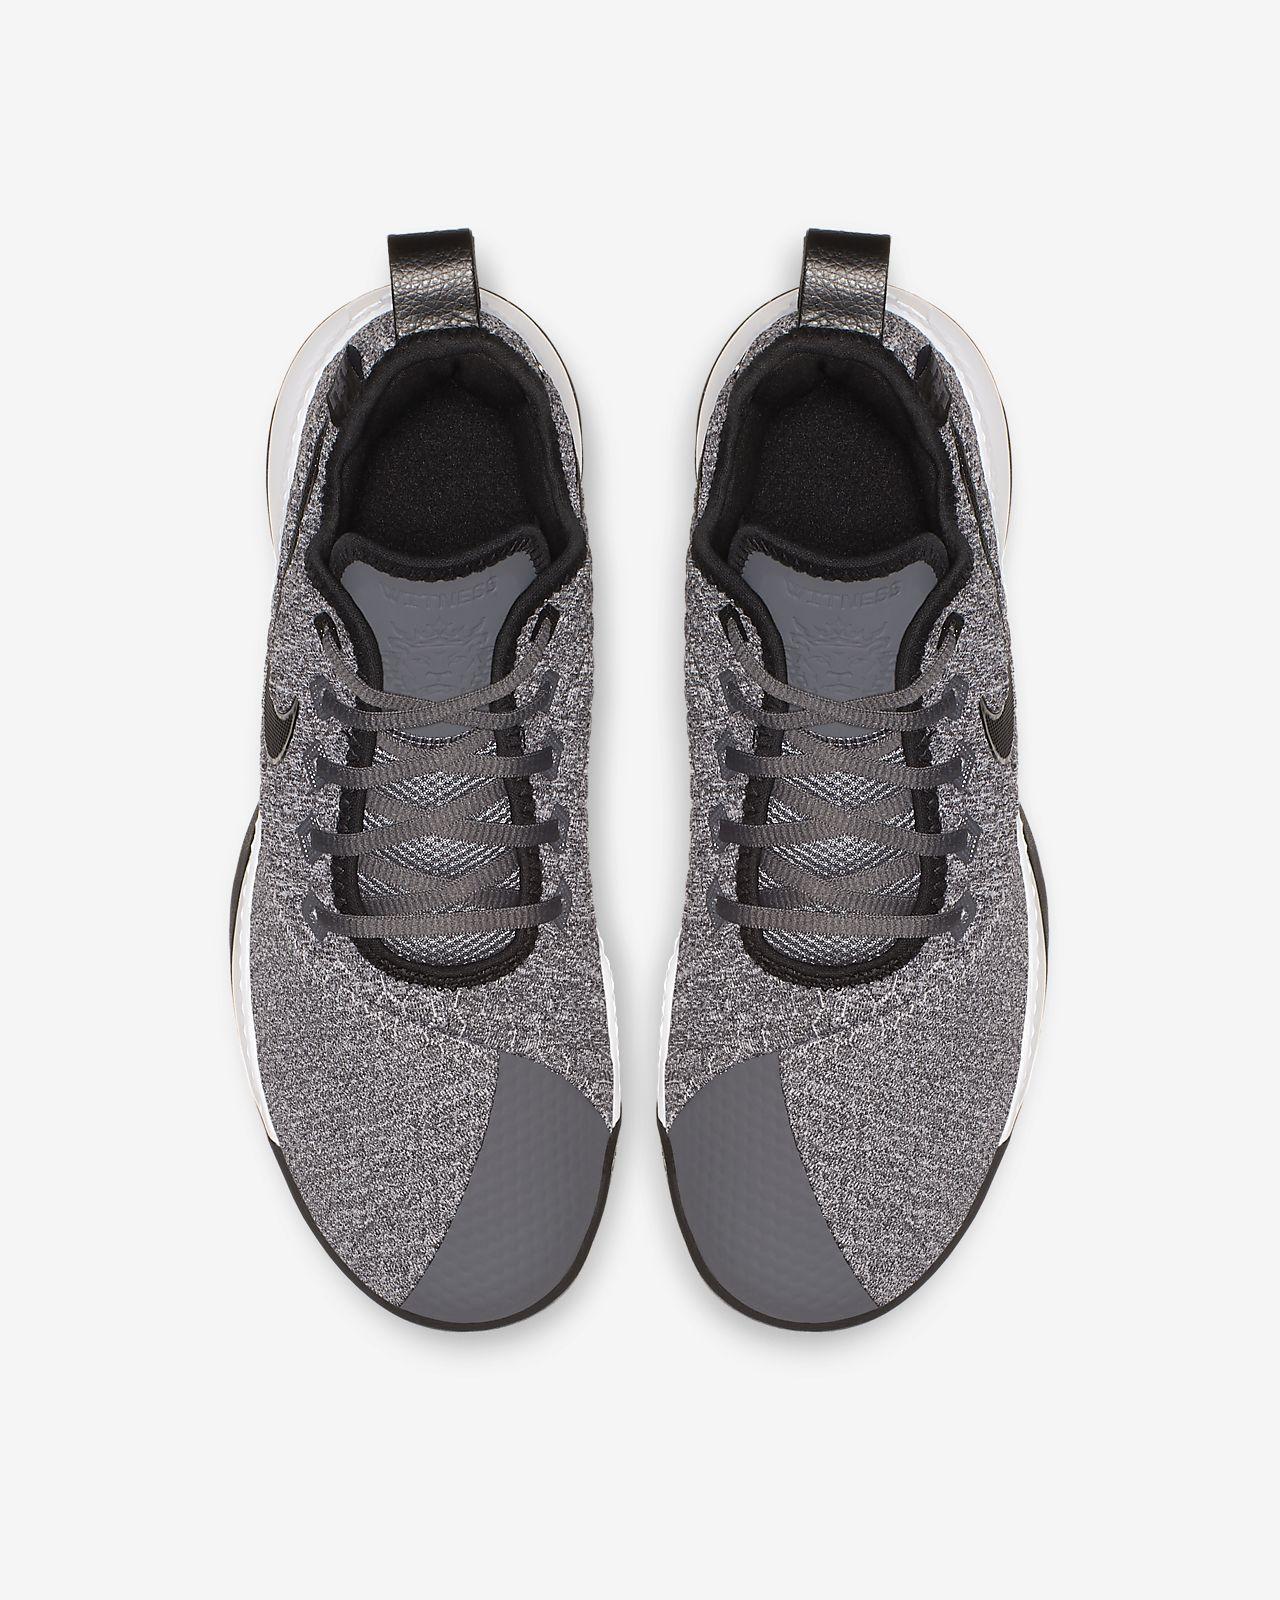 cbeb4b61e48 LeBron Witness III Men s Shoe. Nike.com NZ